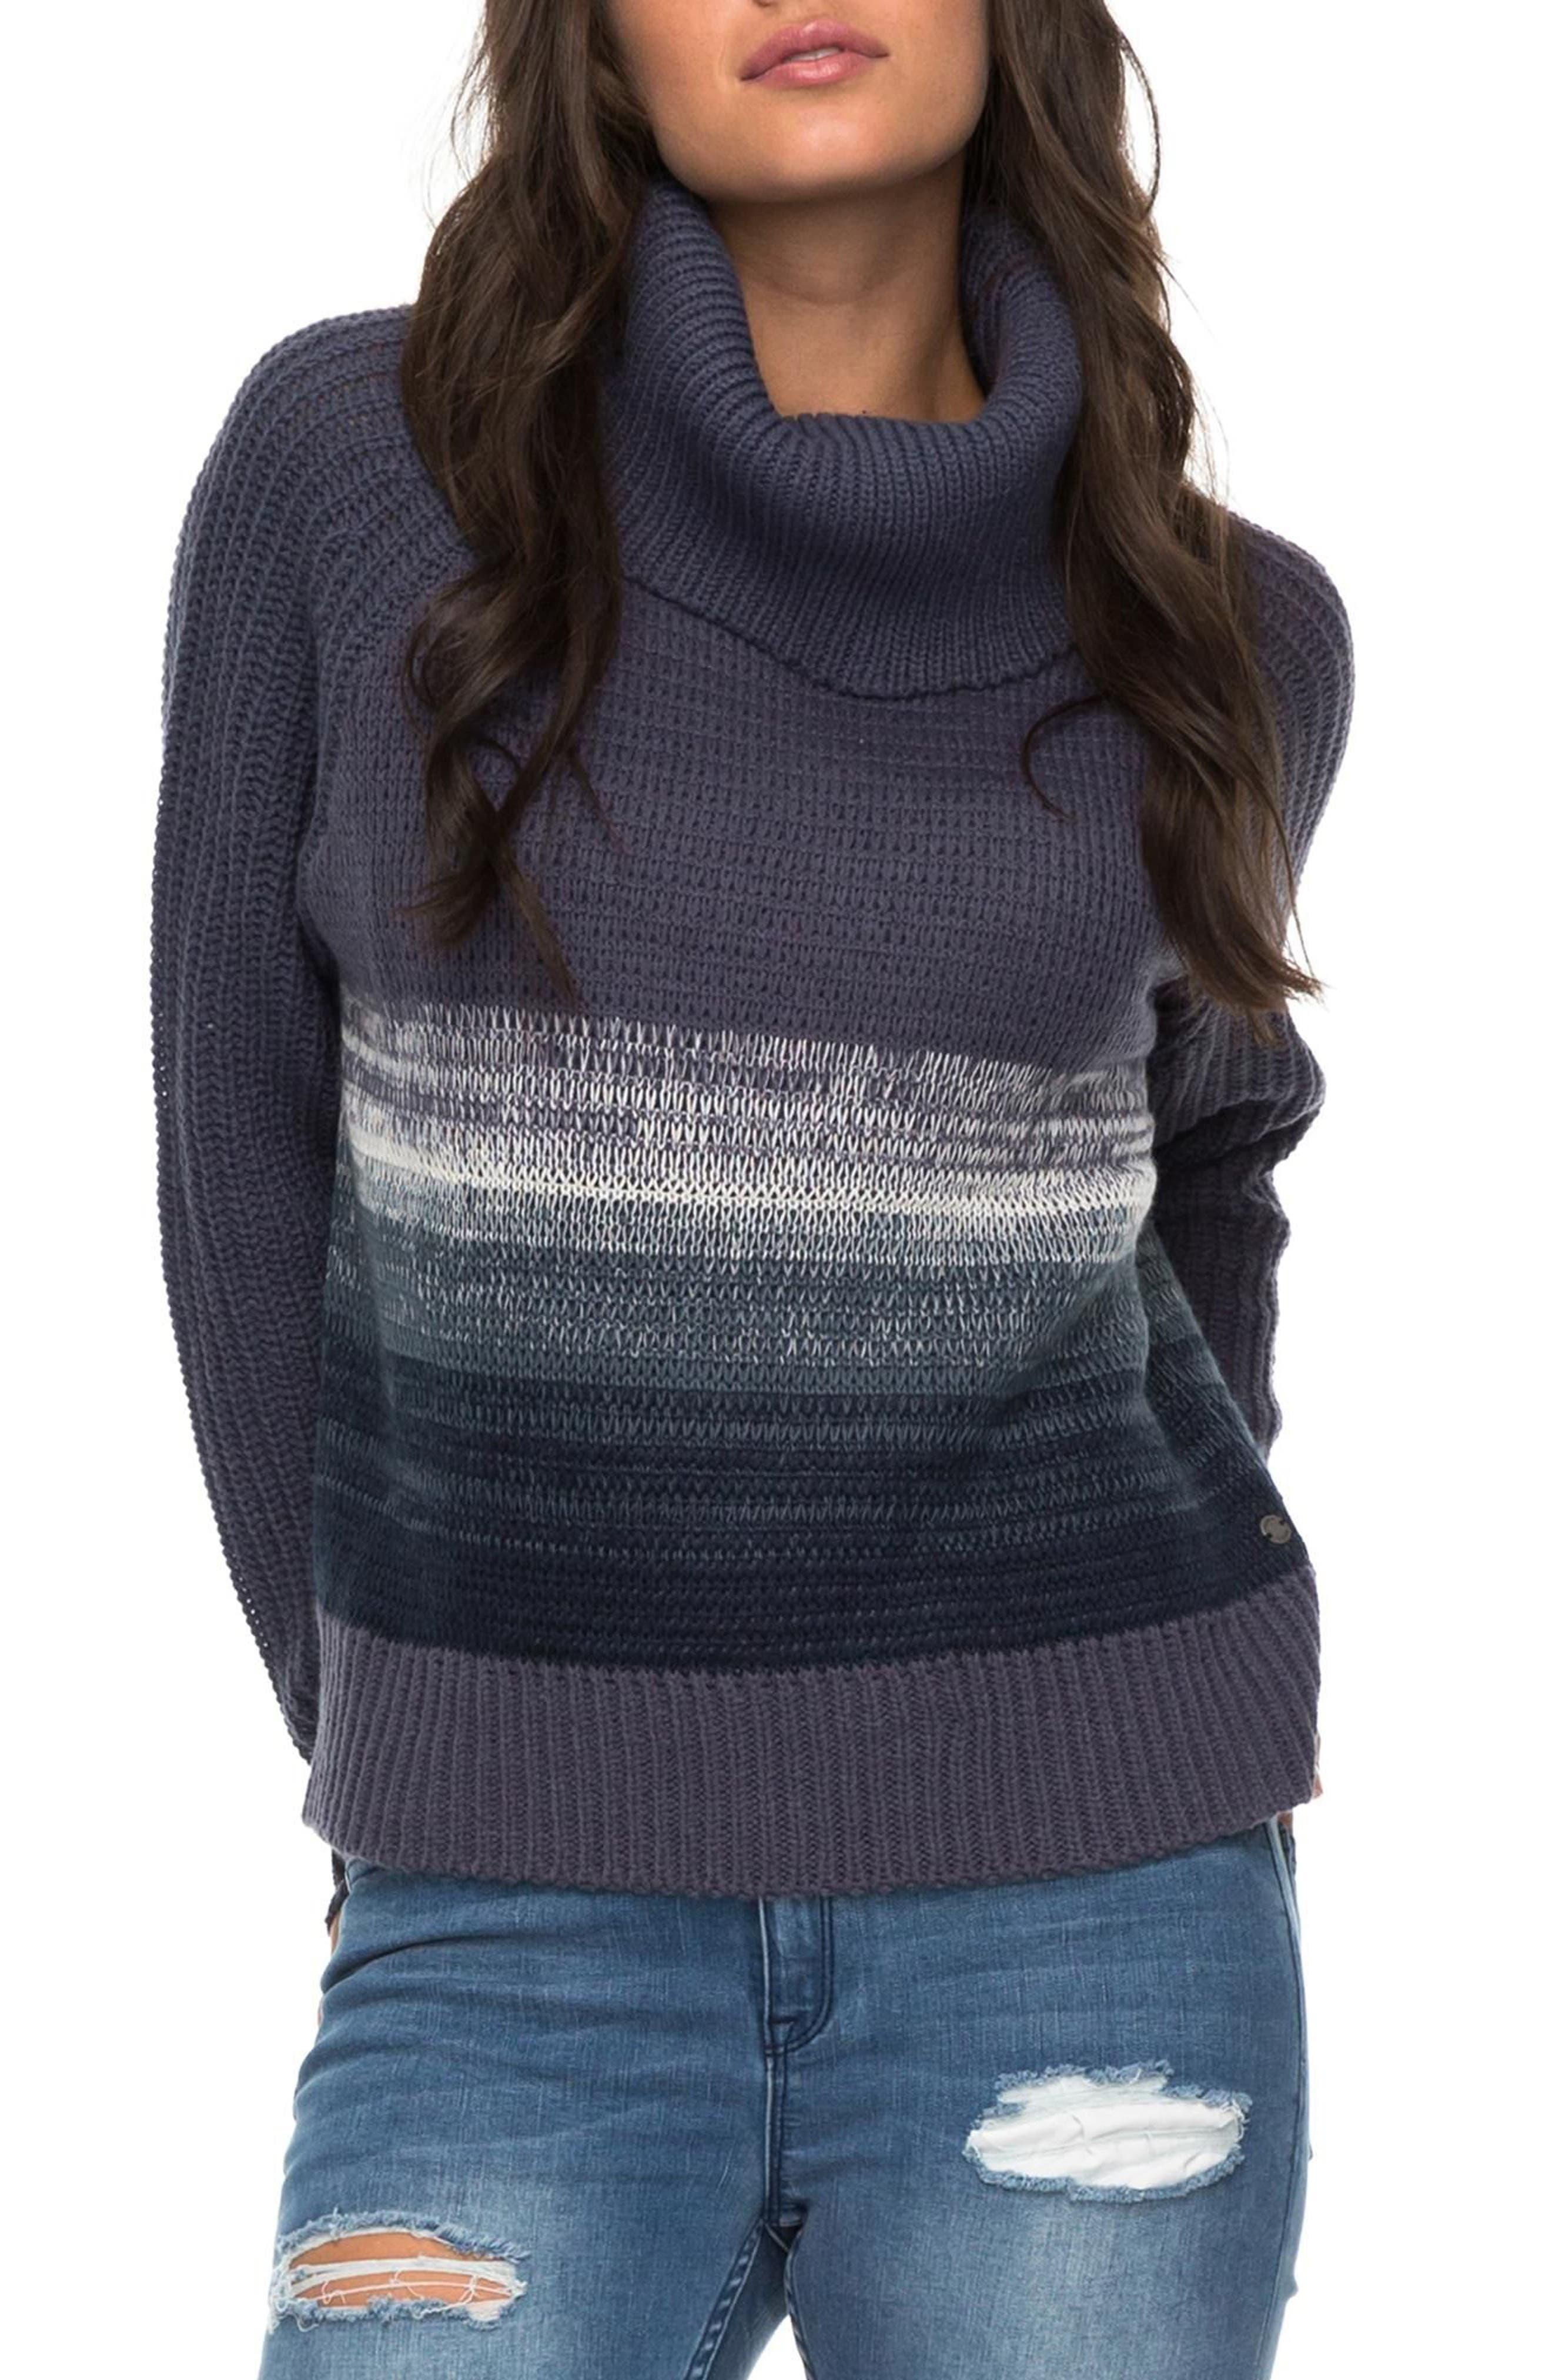 Morning Sun Sweater,                         Main,                         color, Nightshadow Blue